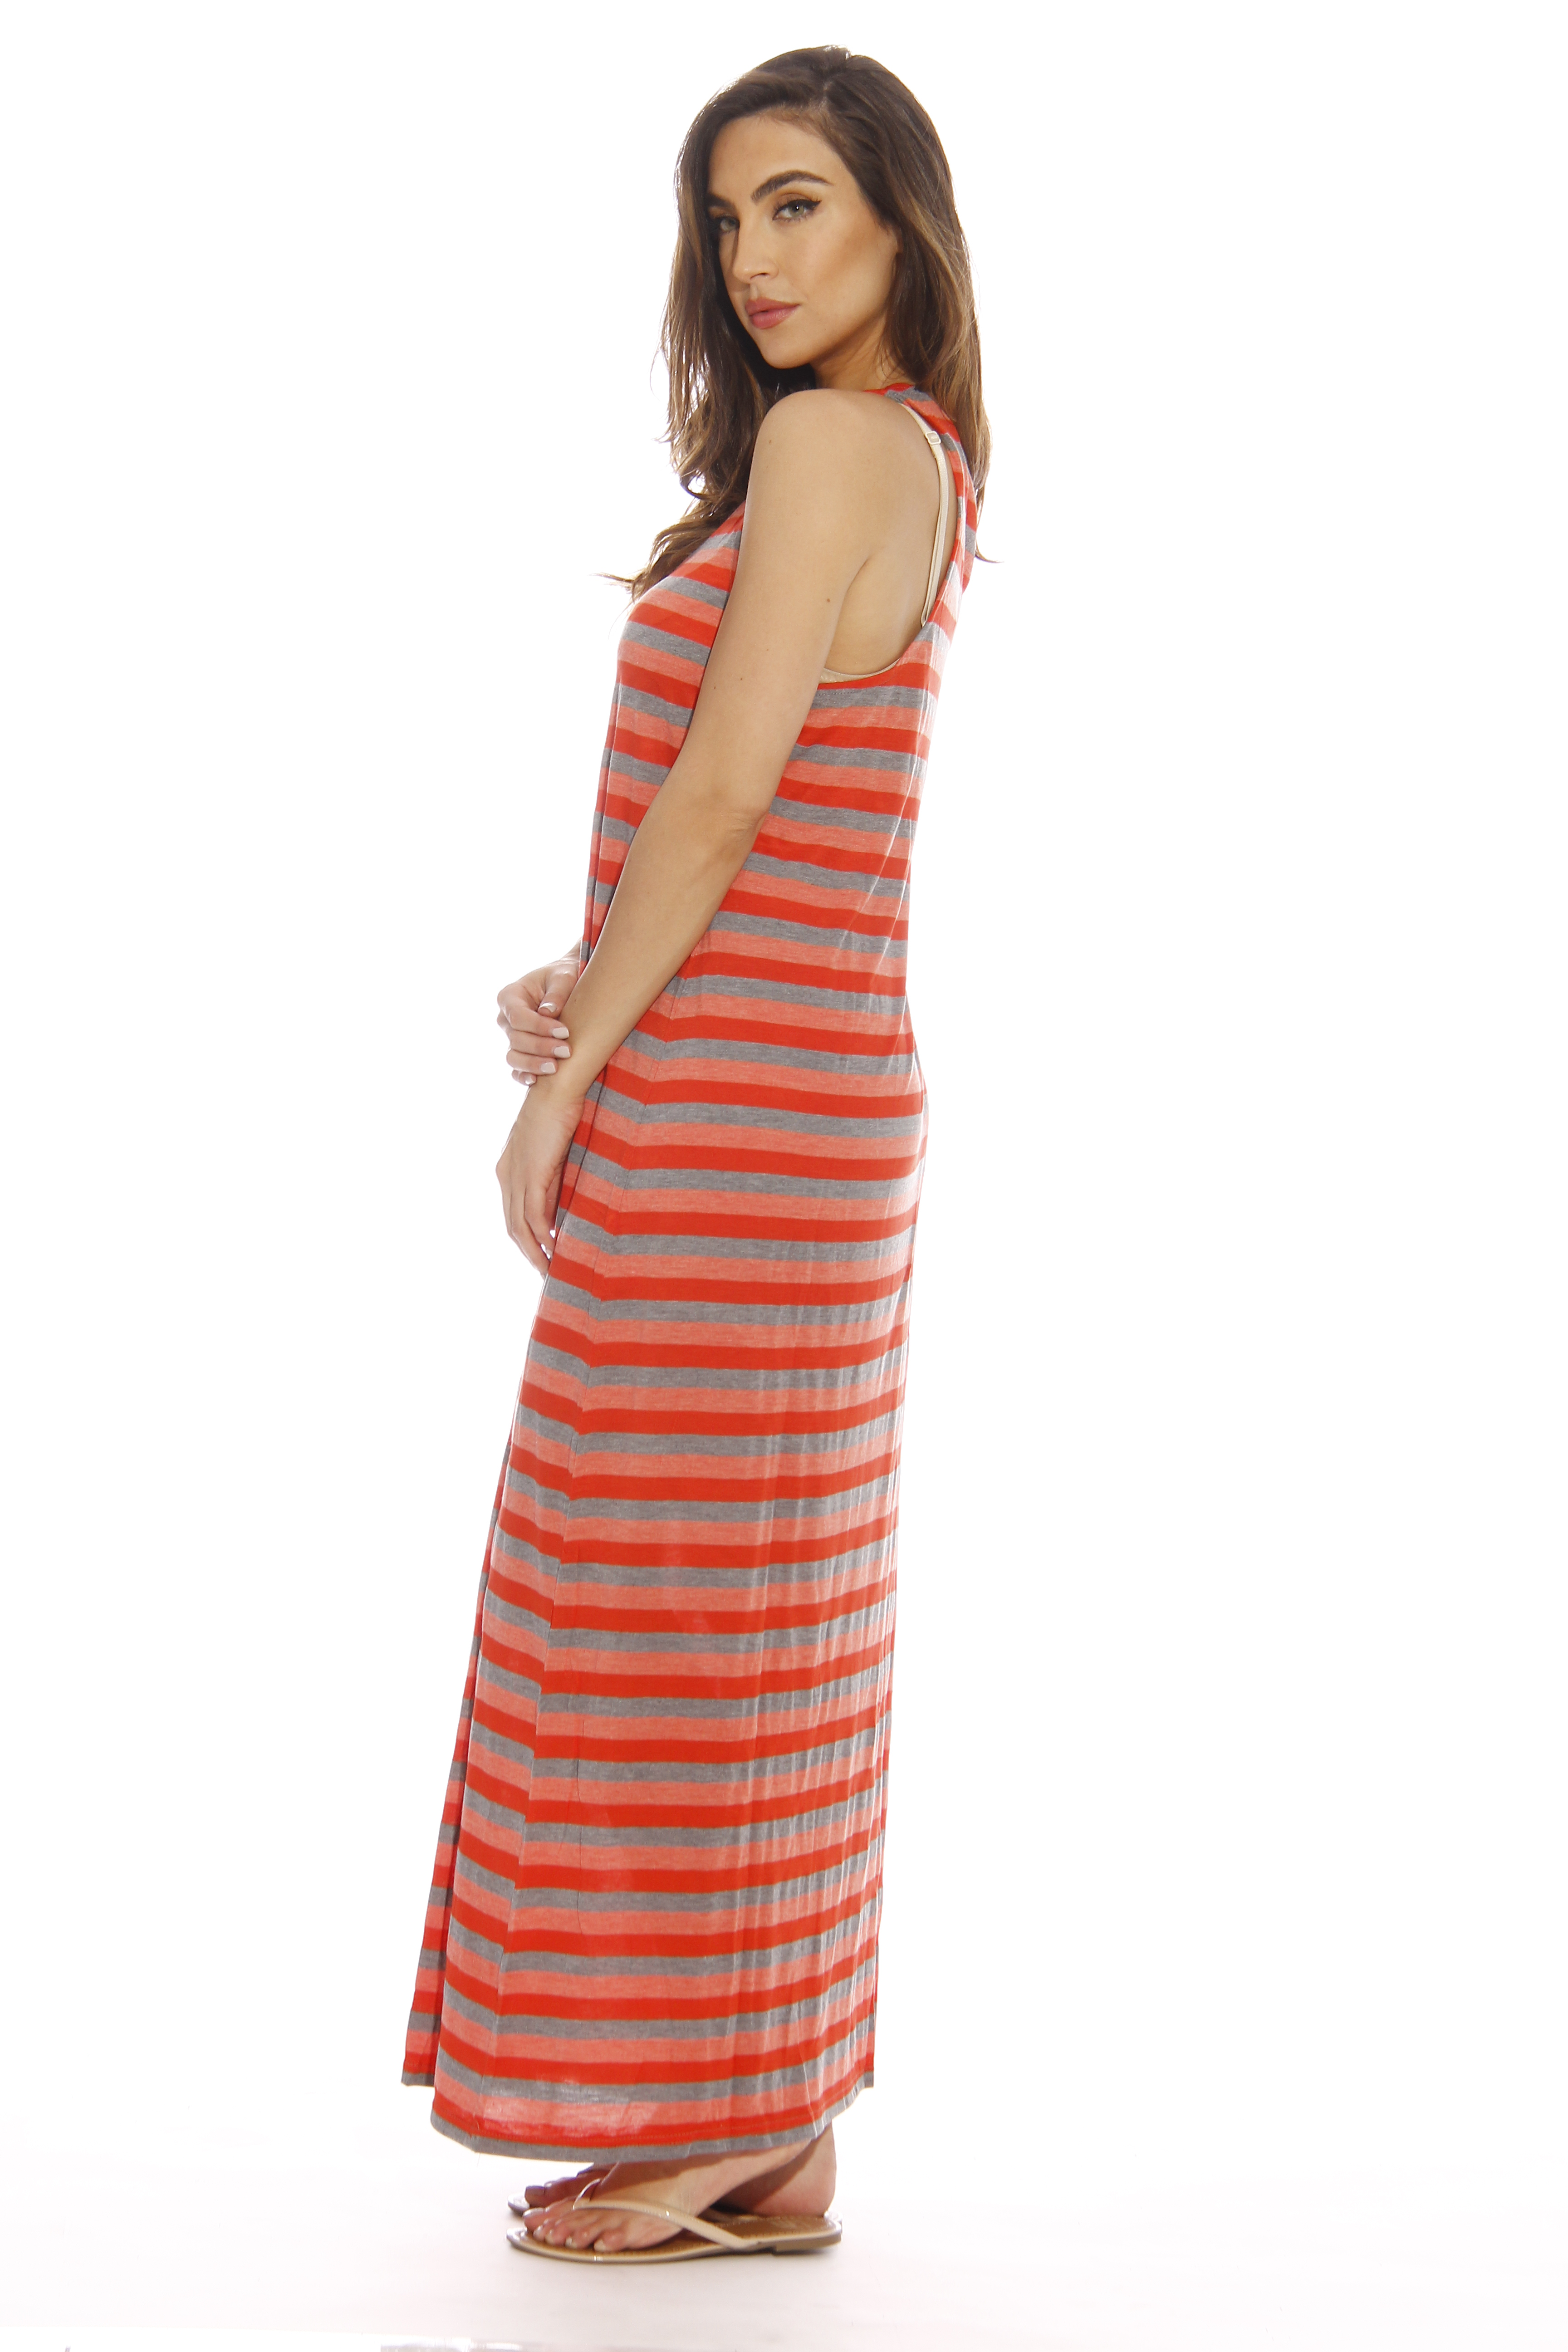 Maurice's Watermelon Maxi Dress